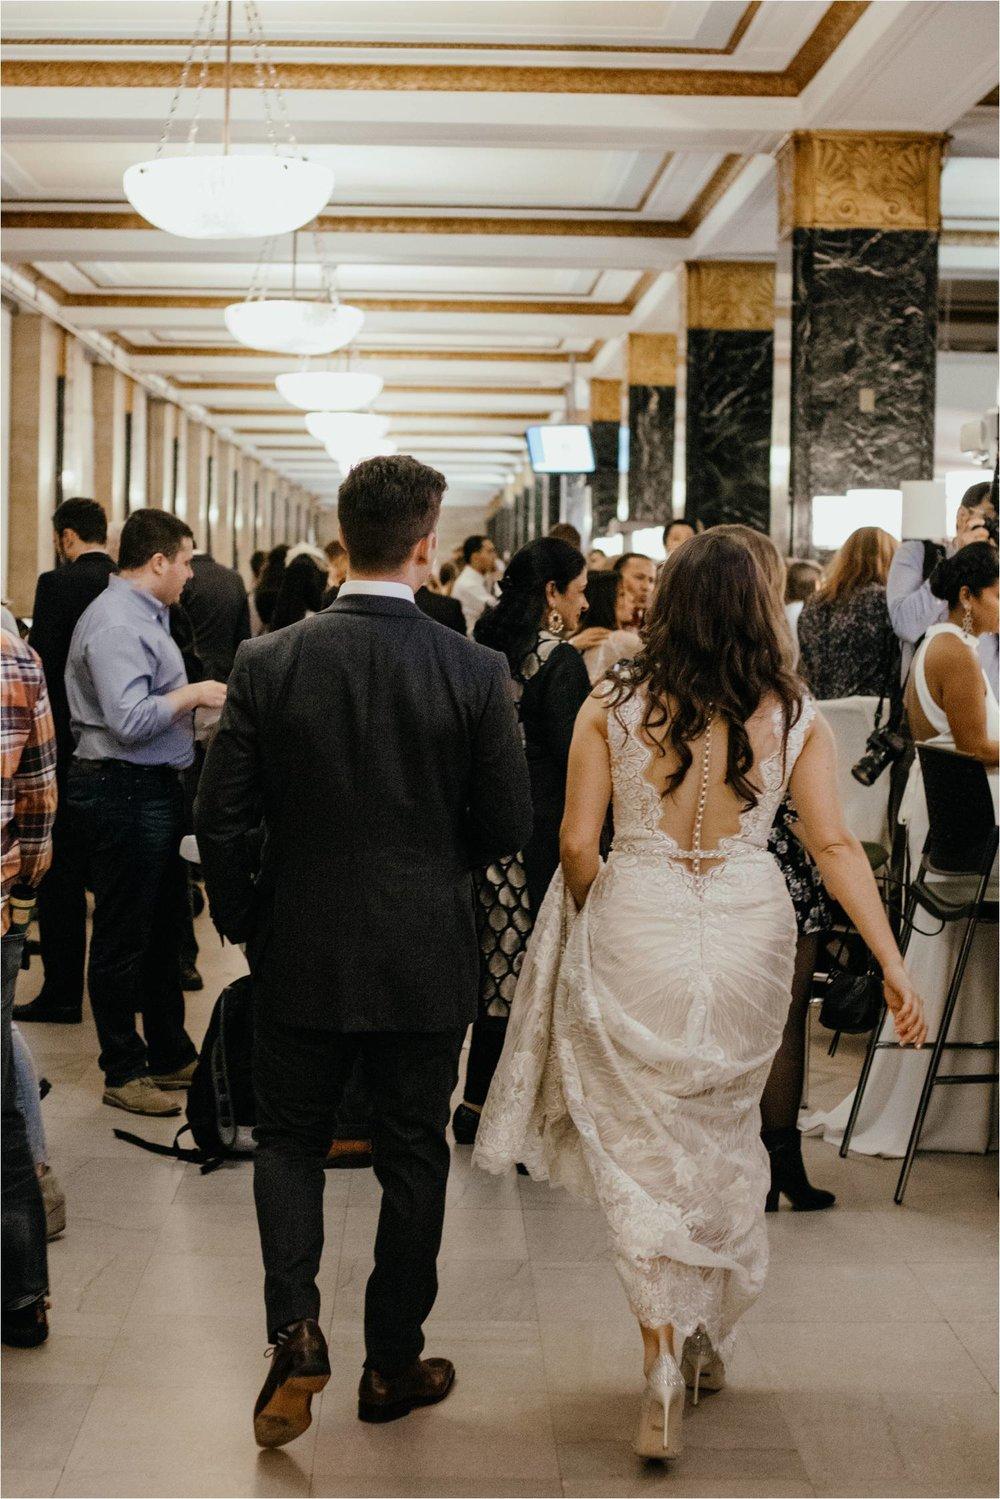 New York City Hall Wedding - NYC Elopement Photographer - City Hall Wedding Photographer - Elopement Photographer